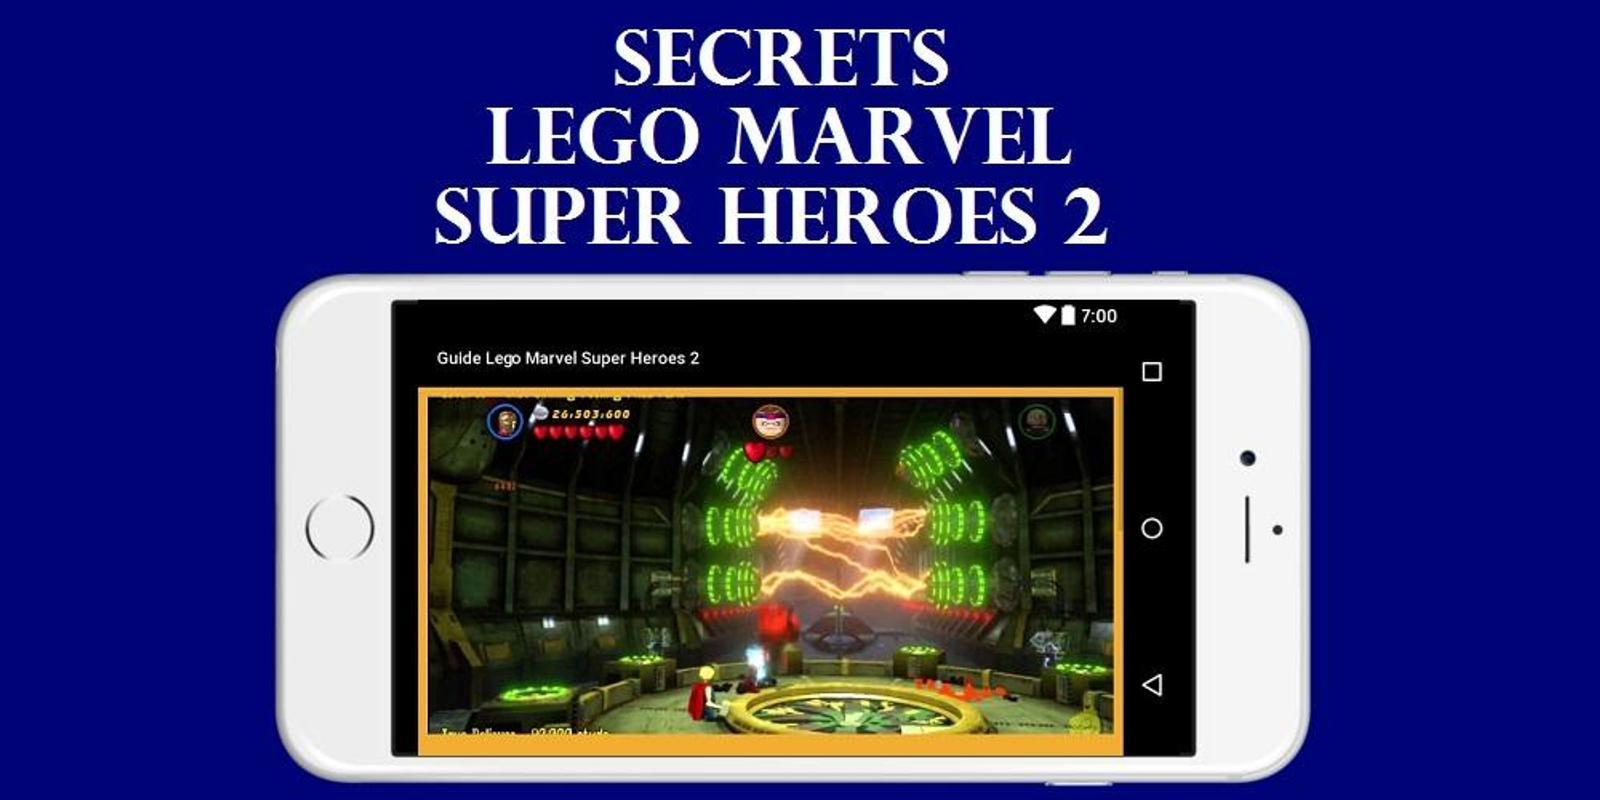 lego marvel superheroes guide